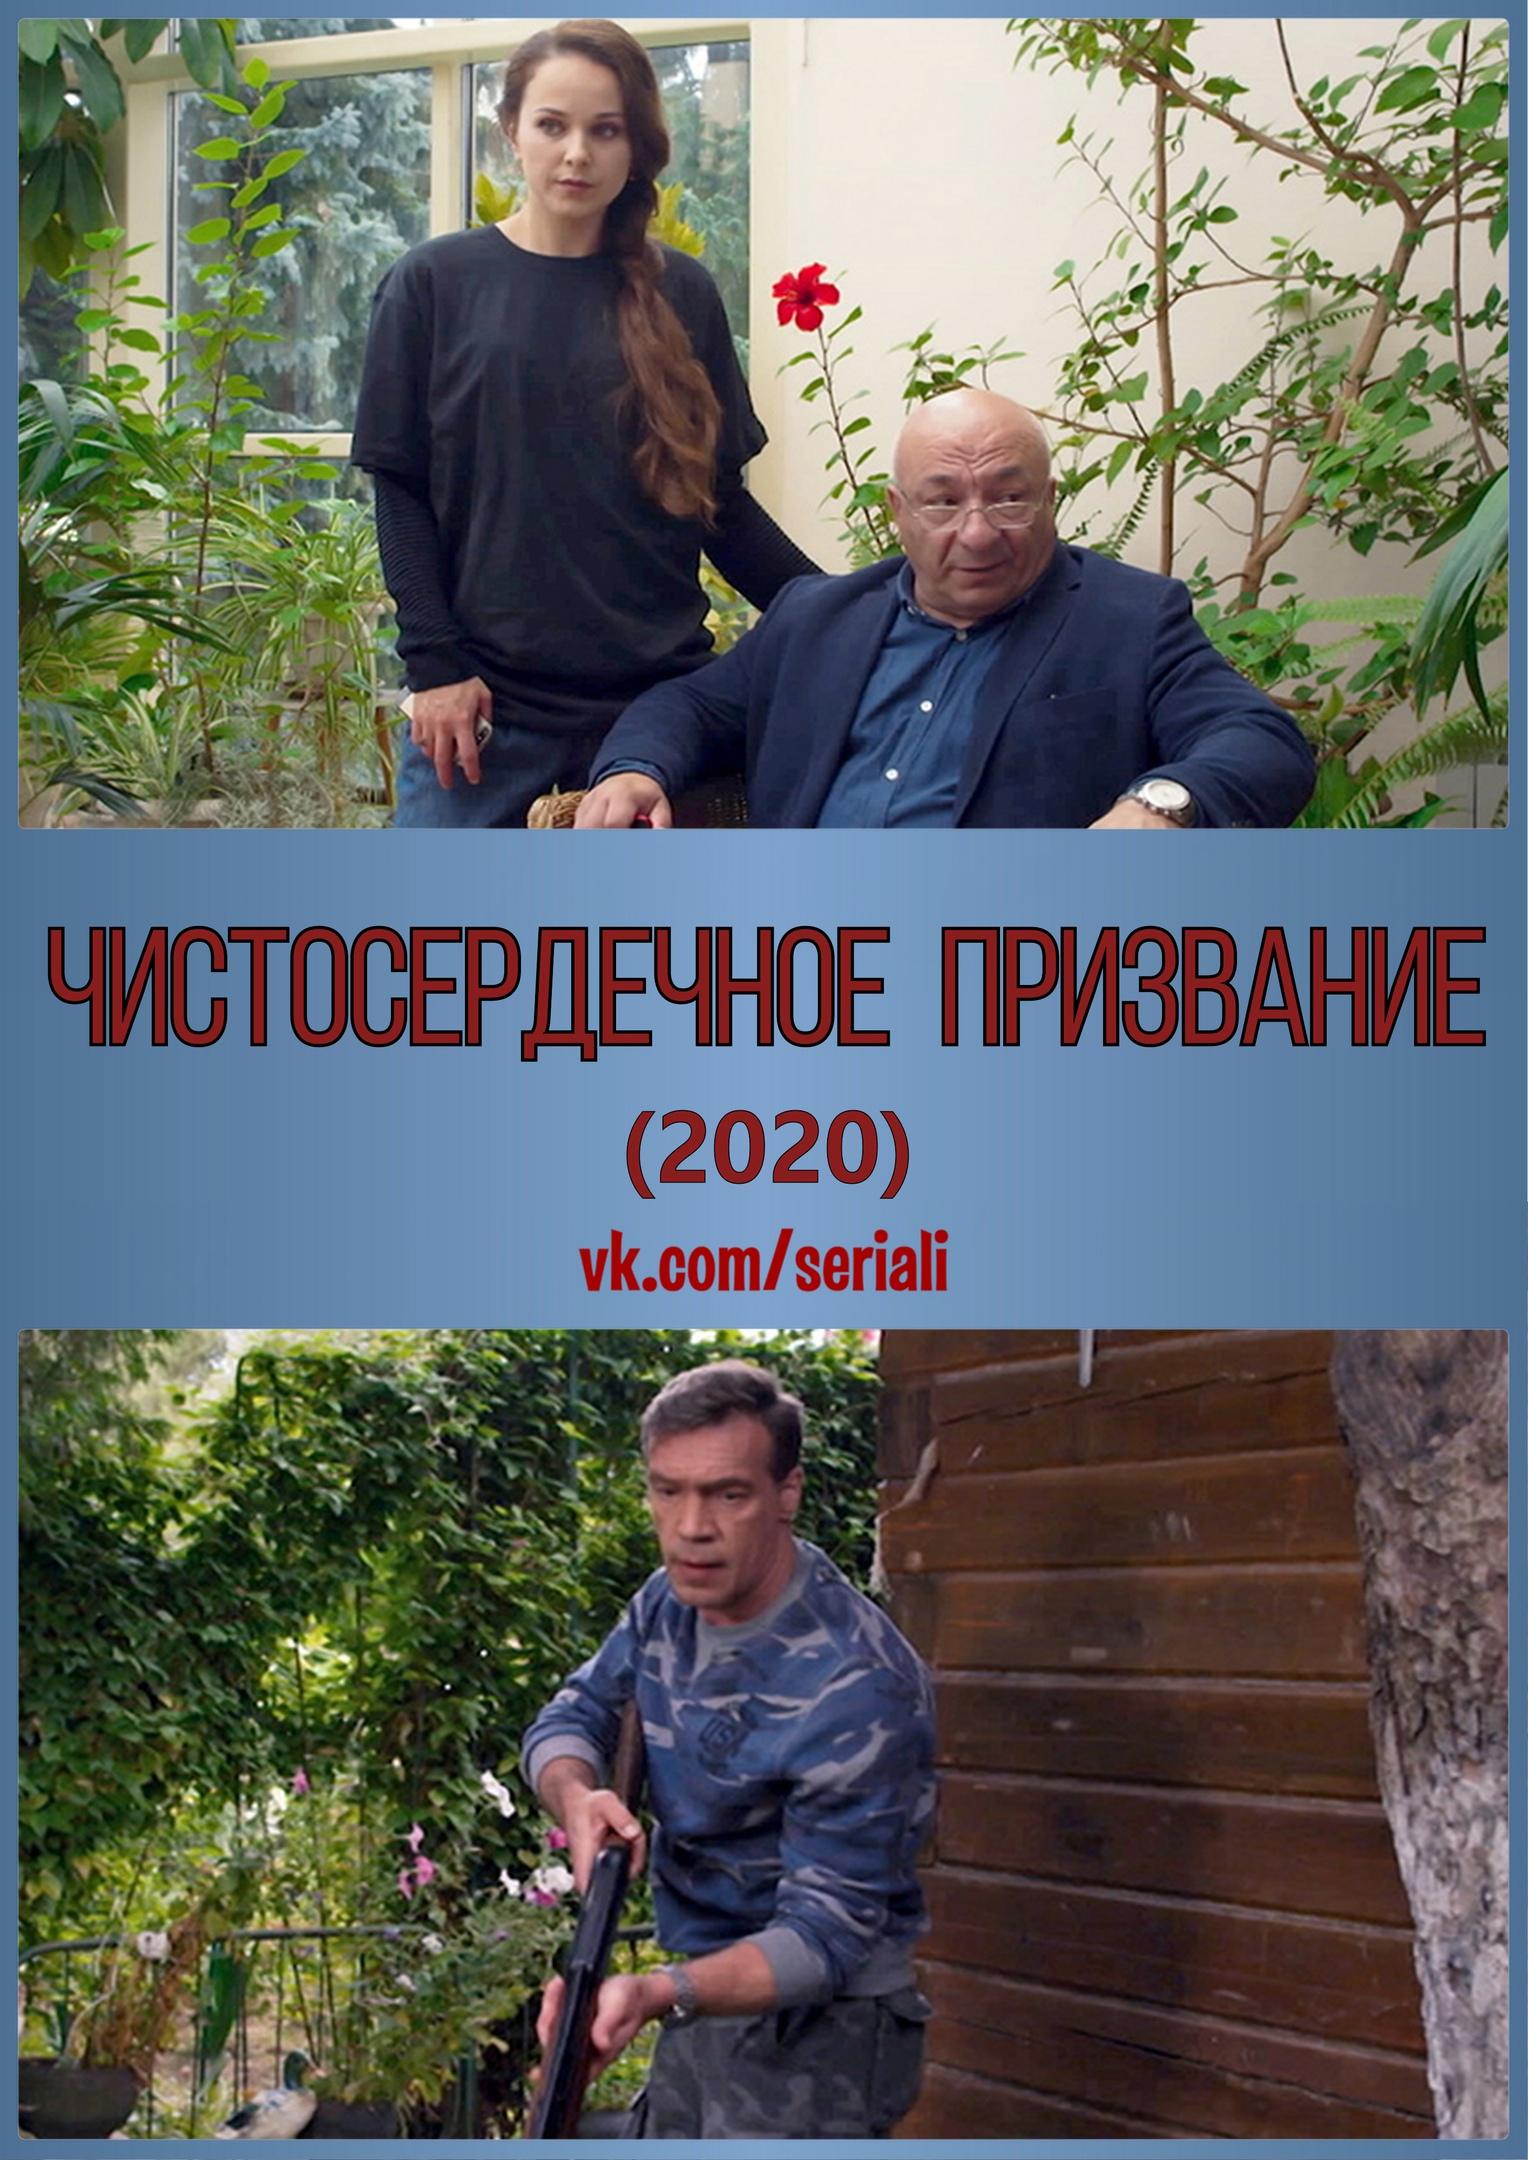 Детектив «Чиcтocepдeчнoe пpизвaниe» (2020) 1-4 серия из 4 HD